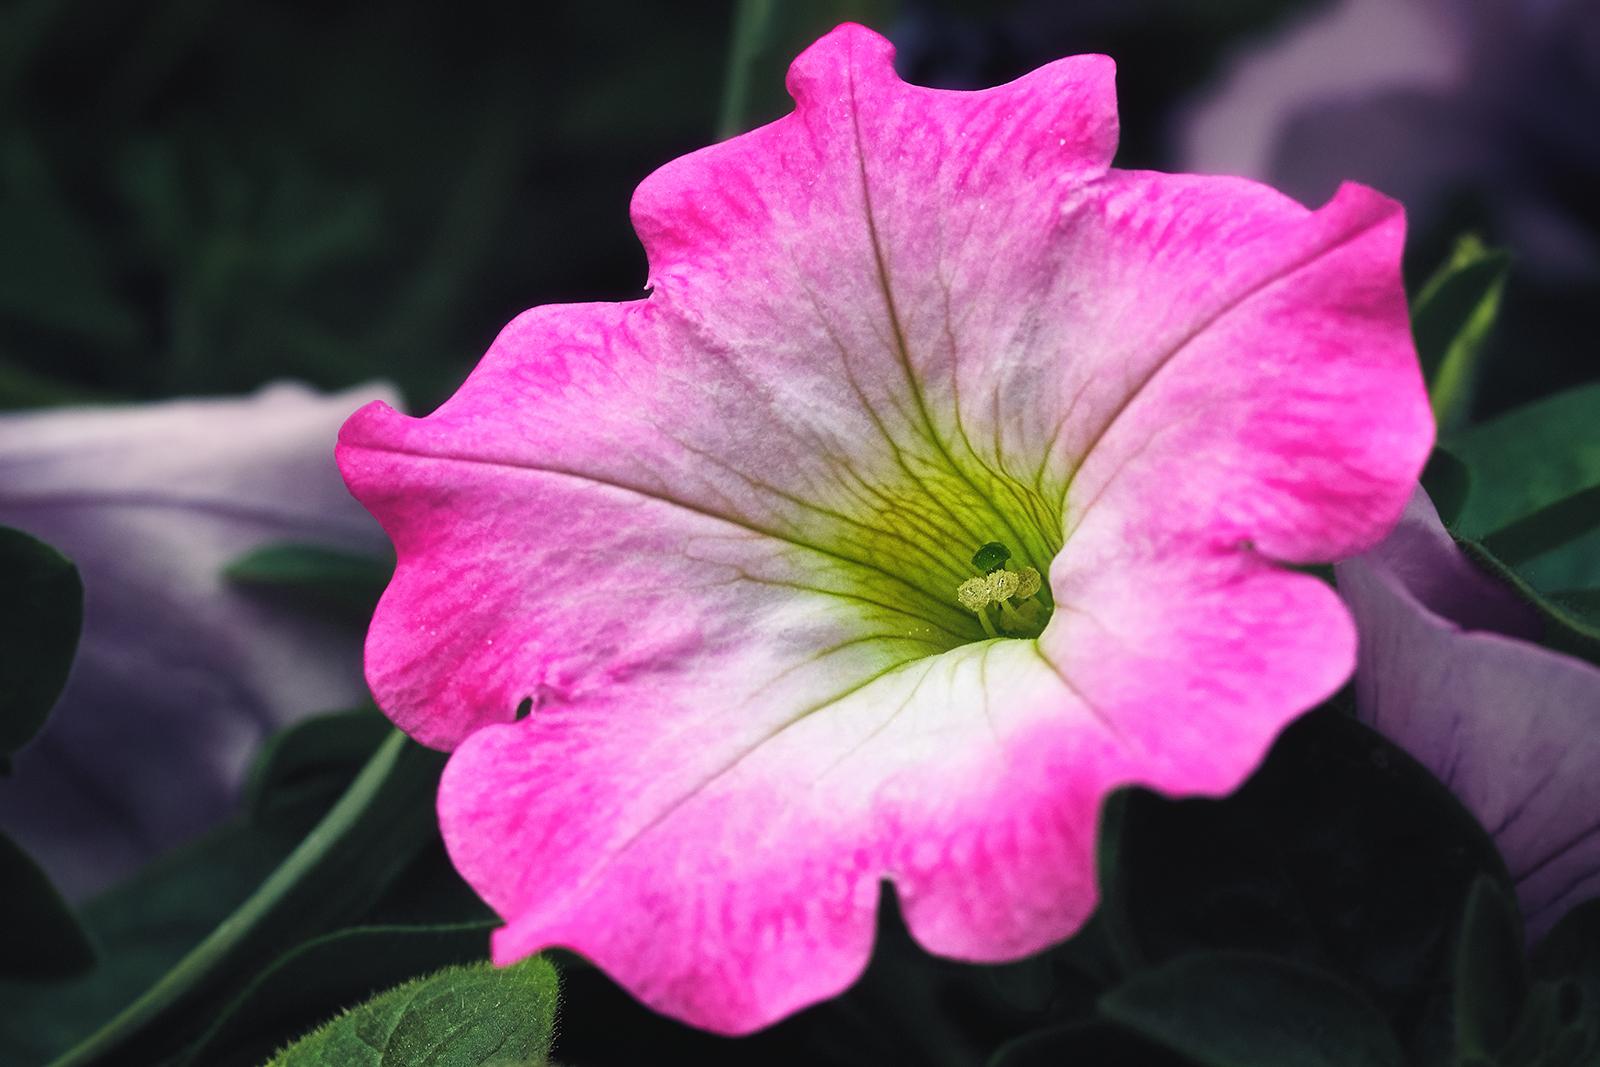 Portrait of a Pink Flower